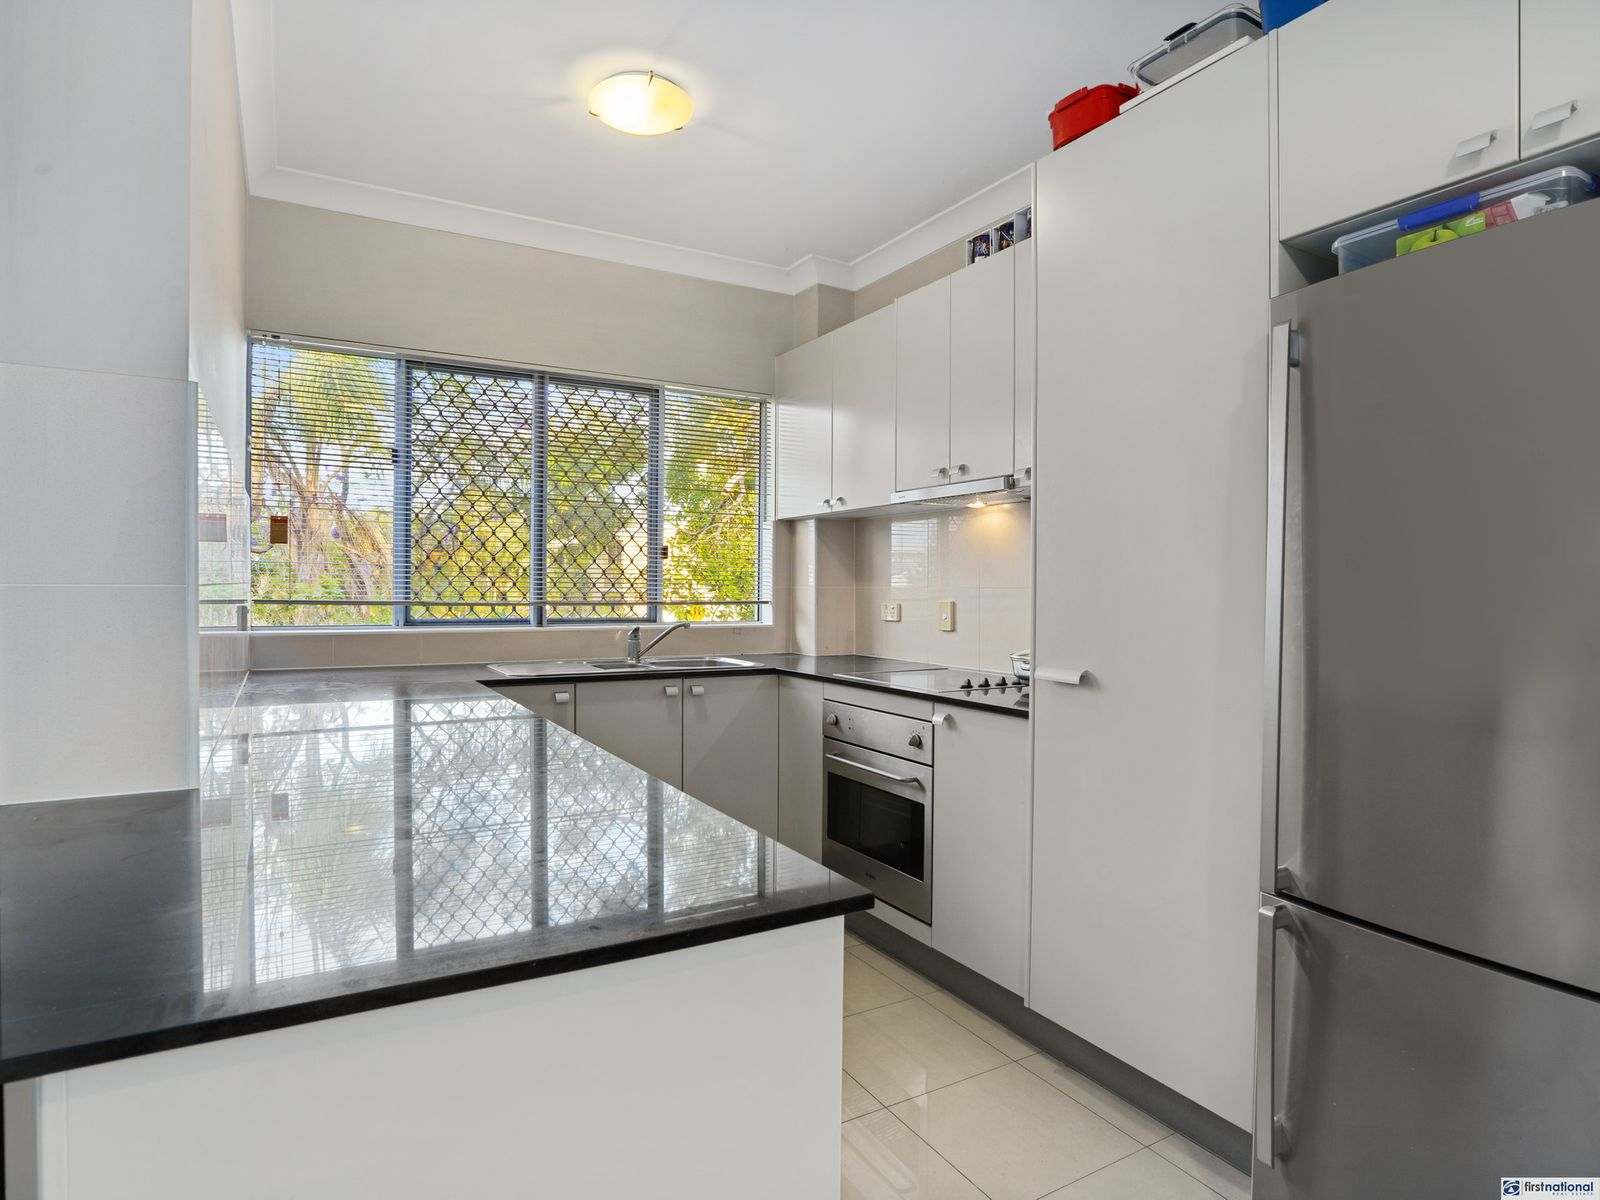 6/17 Cardross Street, Yeerongpilly, QLD 4105